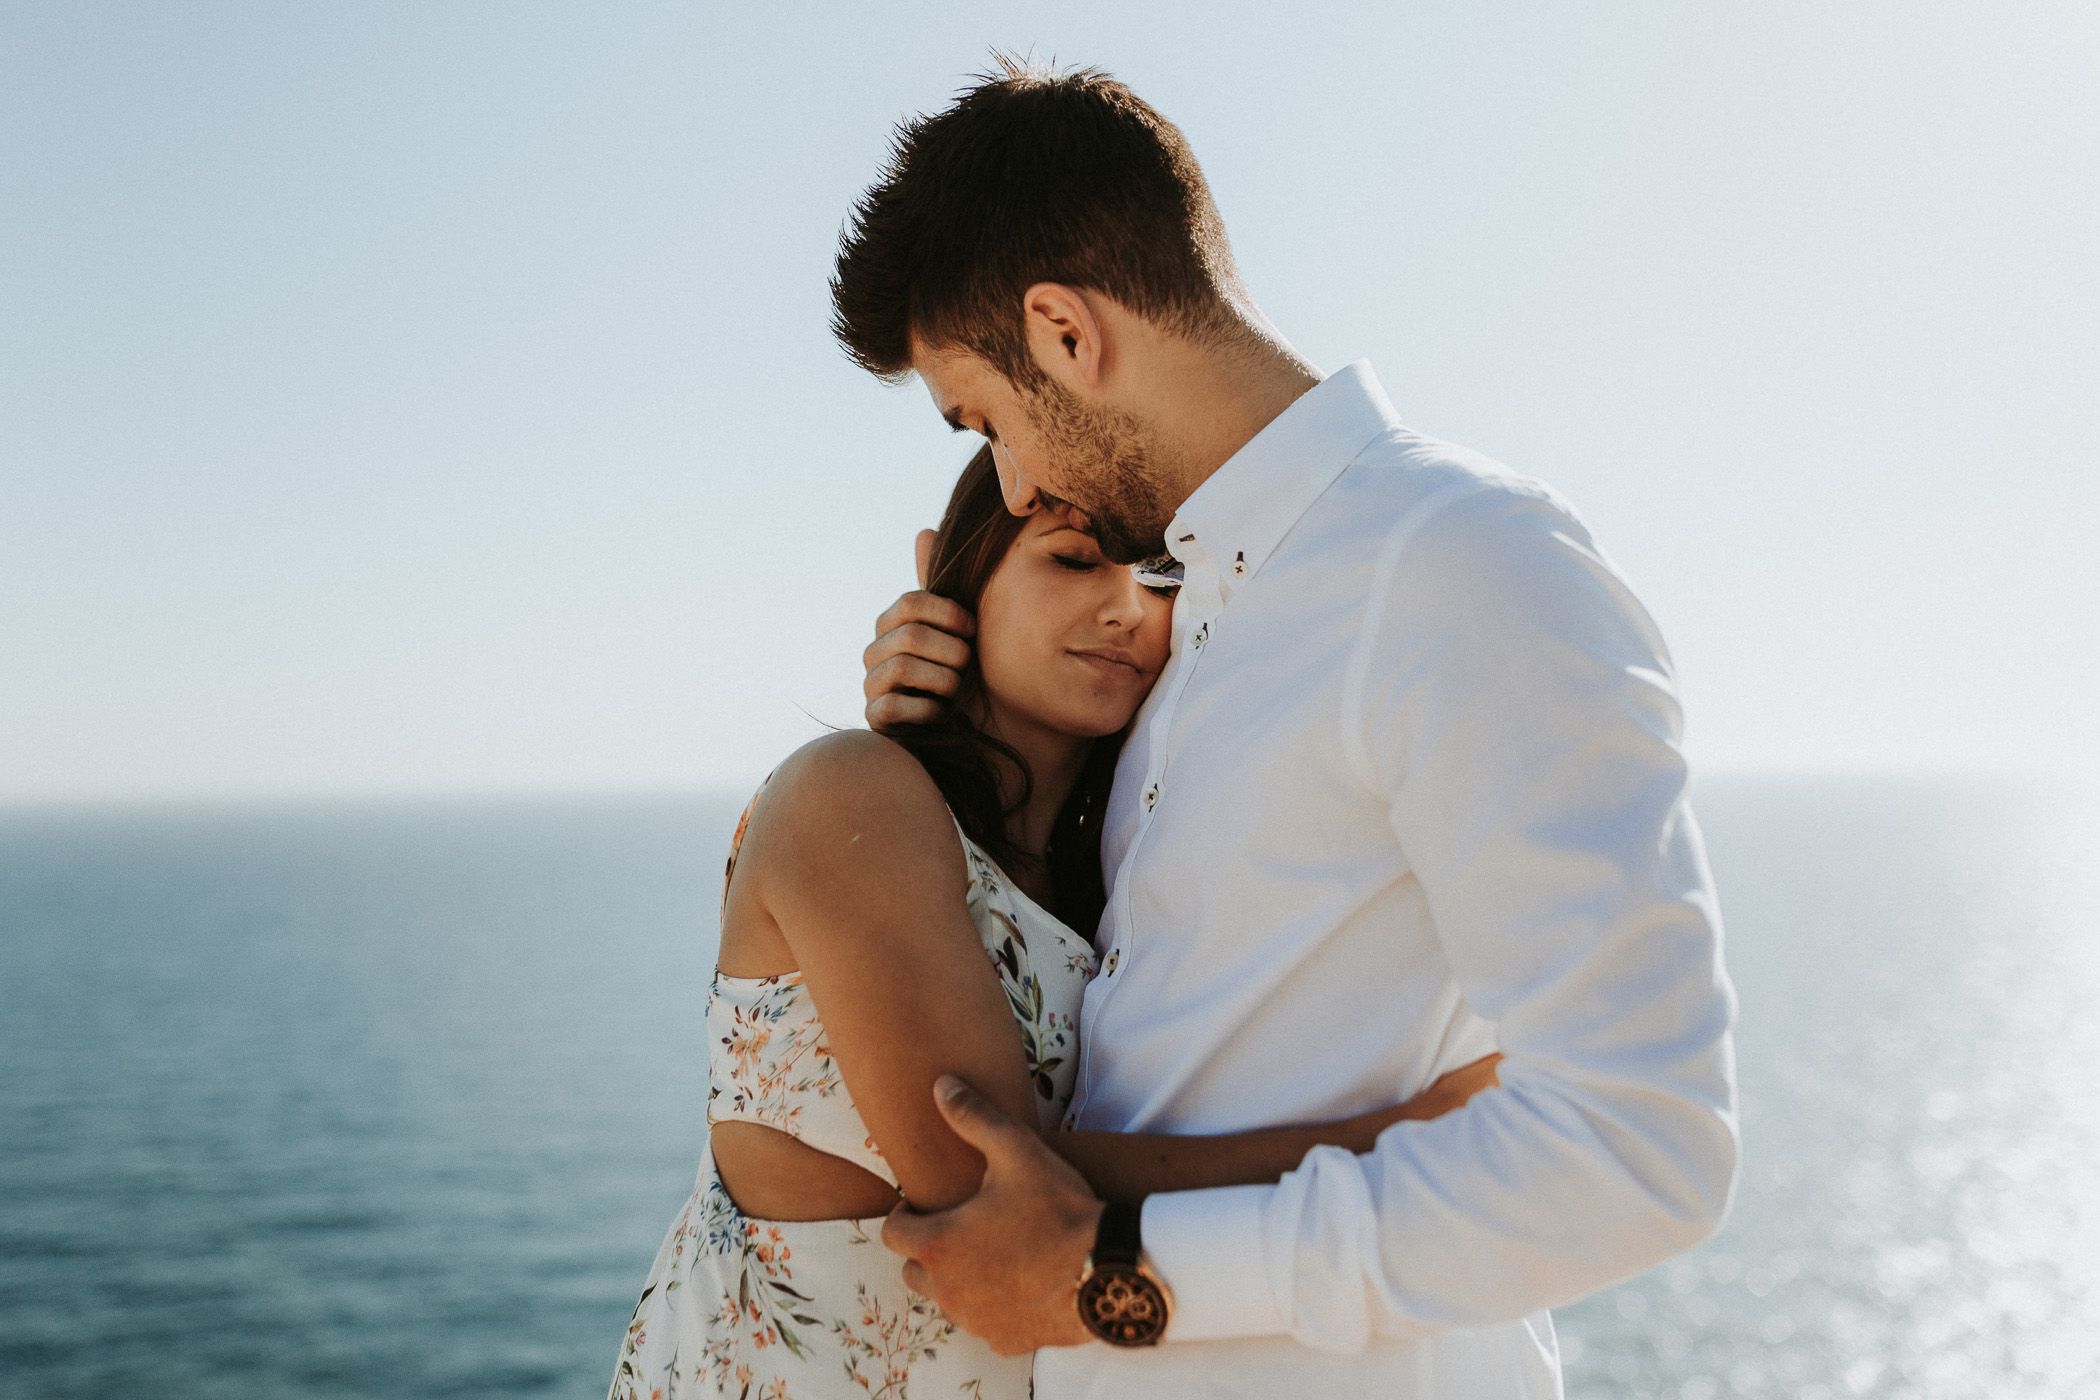 DanielaMarquardtPhotography_wedding_elopement_mallorca_spain_calapi_palma_lauraandtoni_82